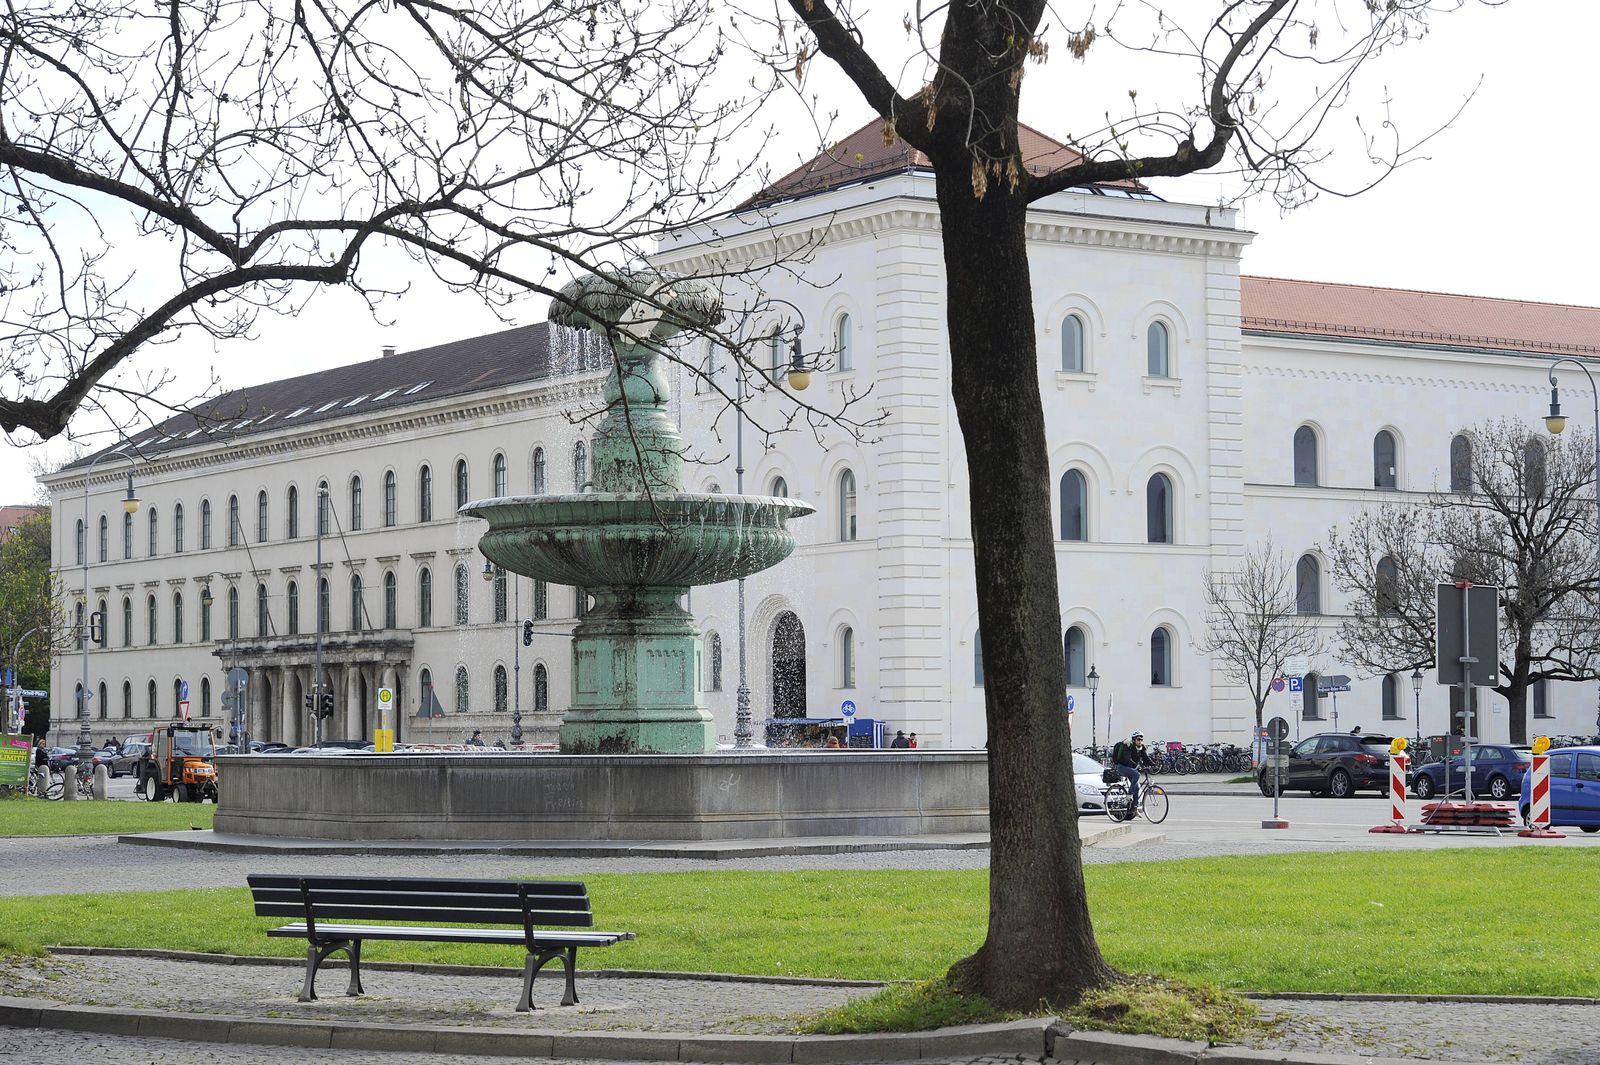 EINMALIGE VERWENDUNG LMU Ludwig Maximilians Universitaet